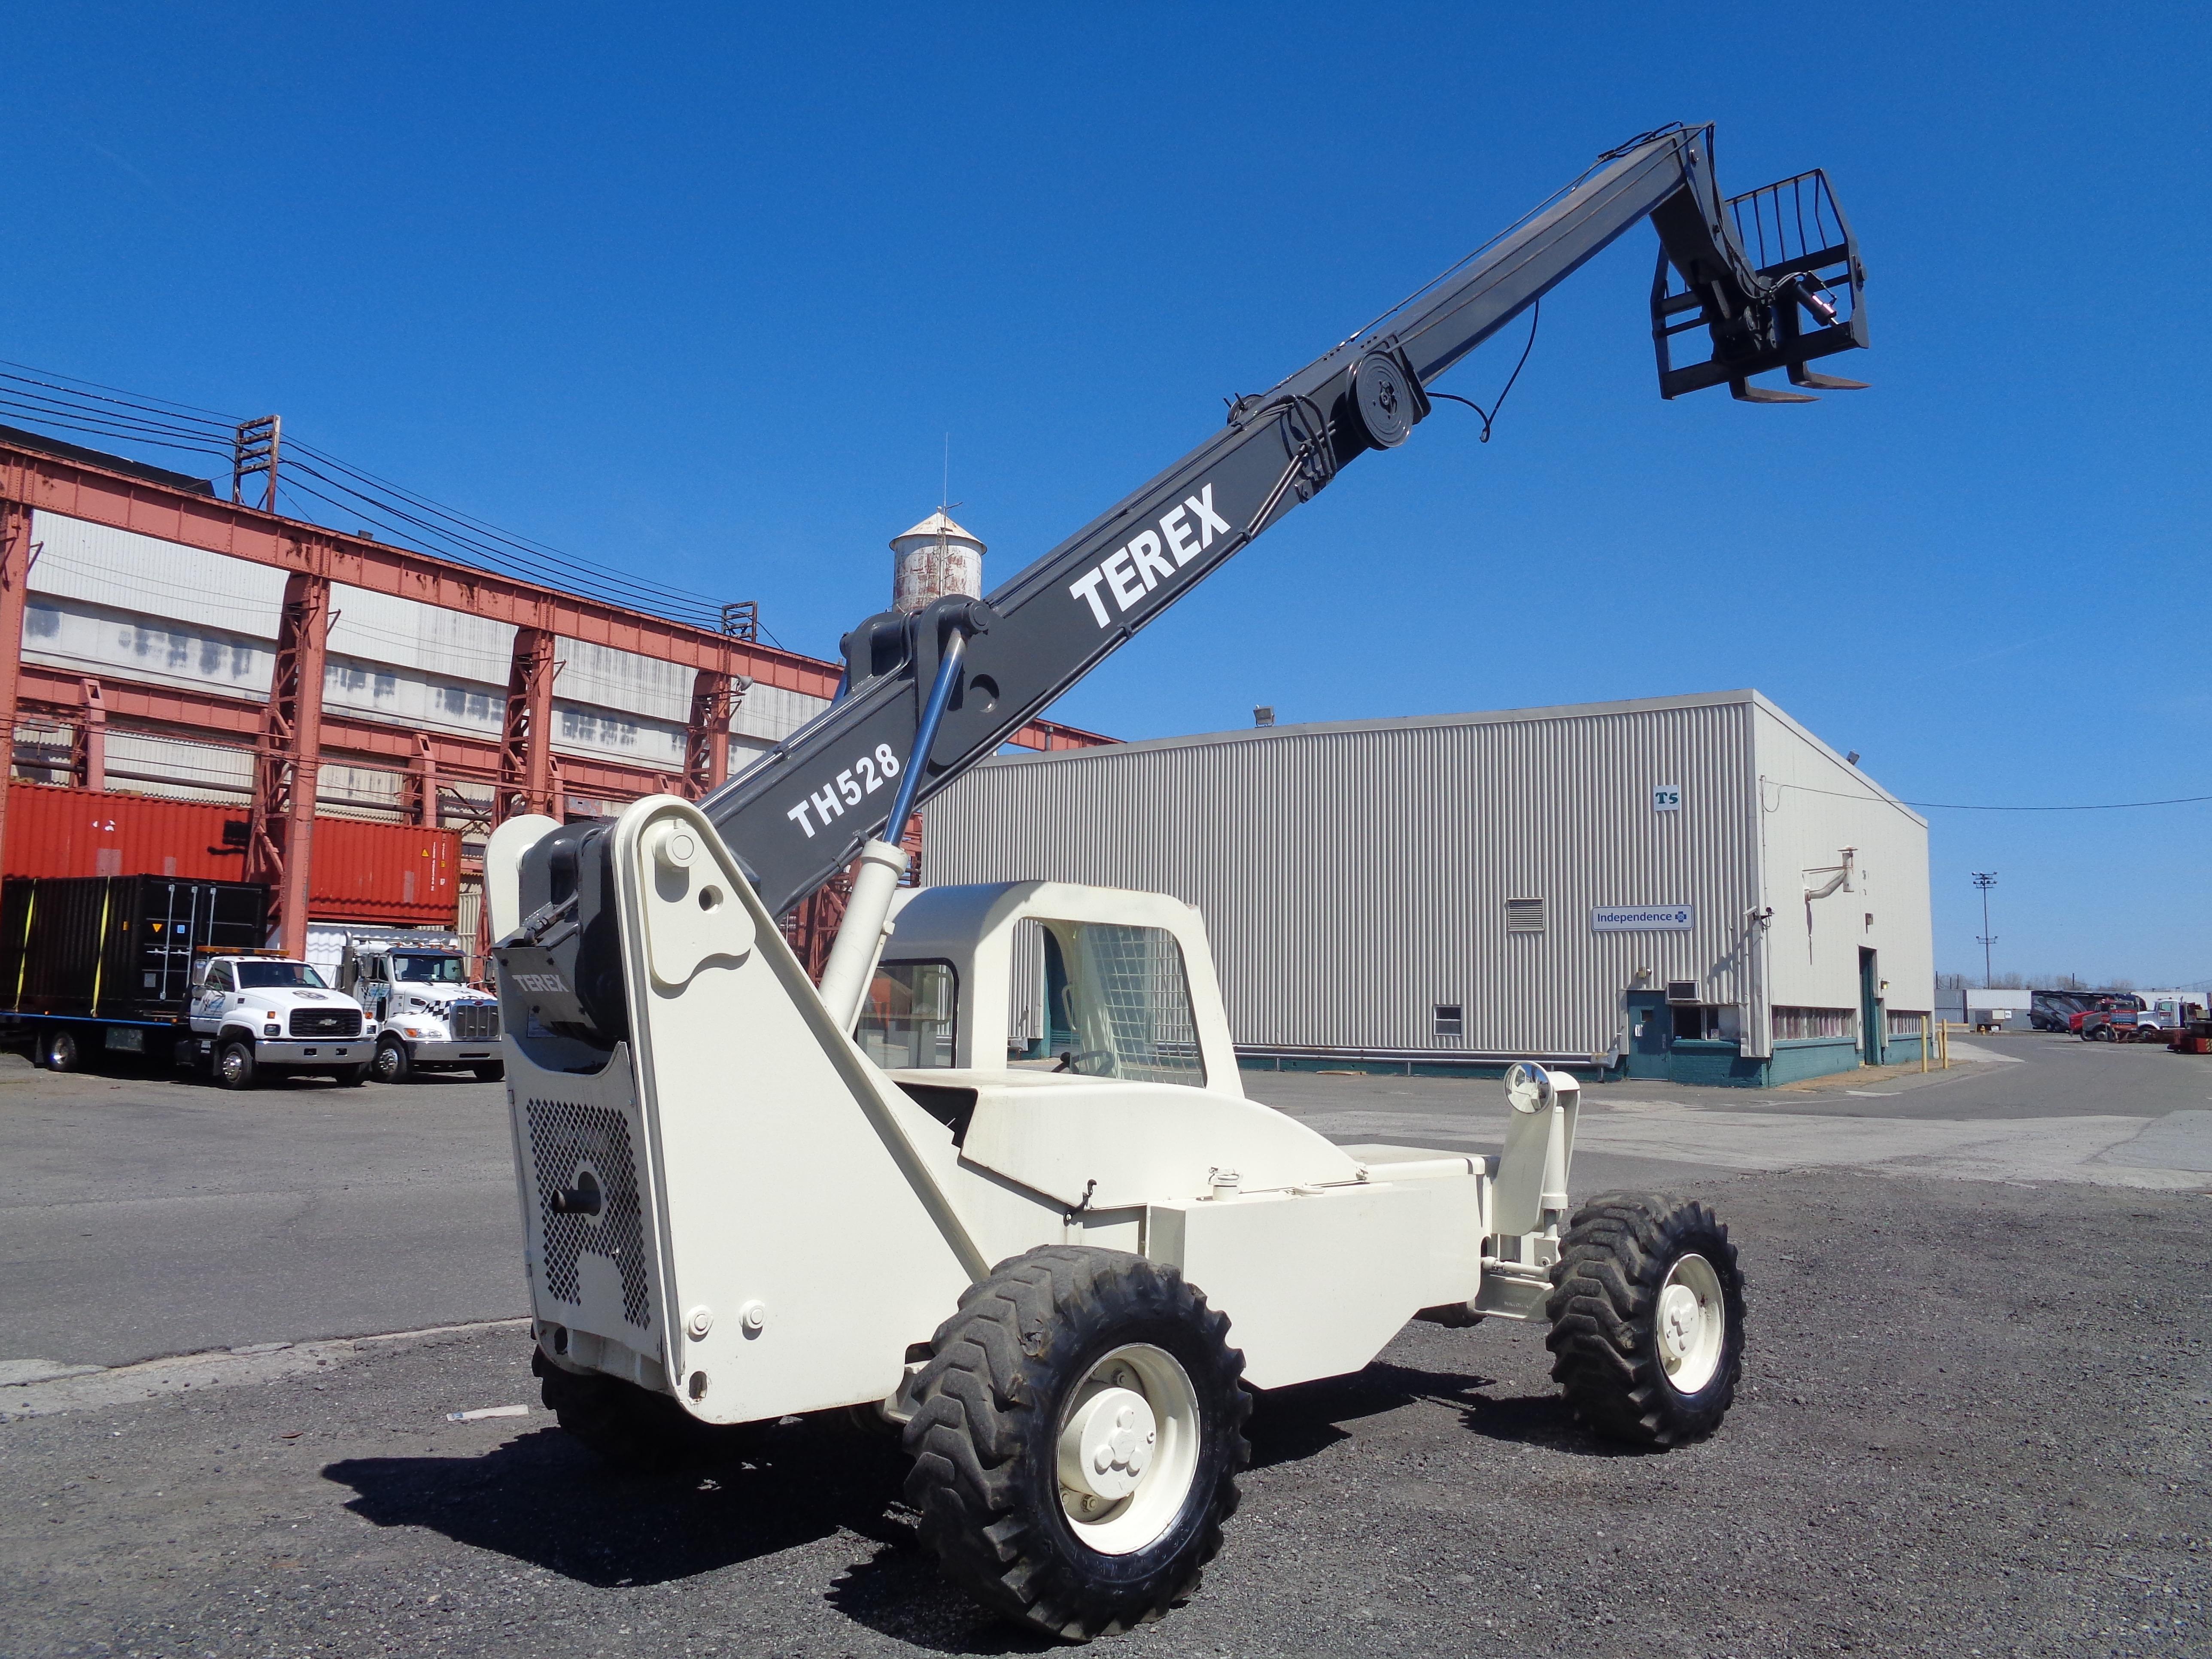 Lot 32 - Terex TH528 Telescopic Forklift